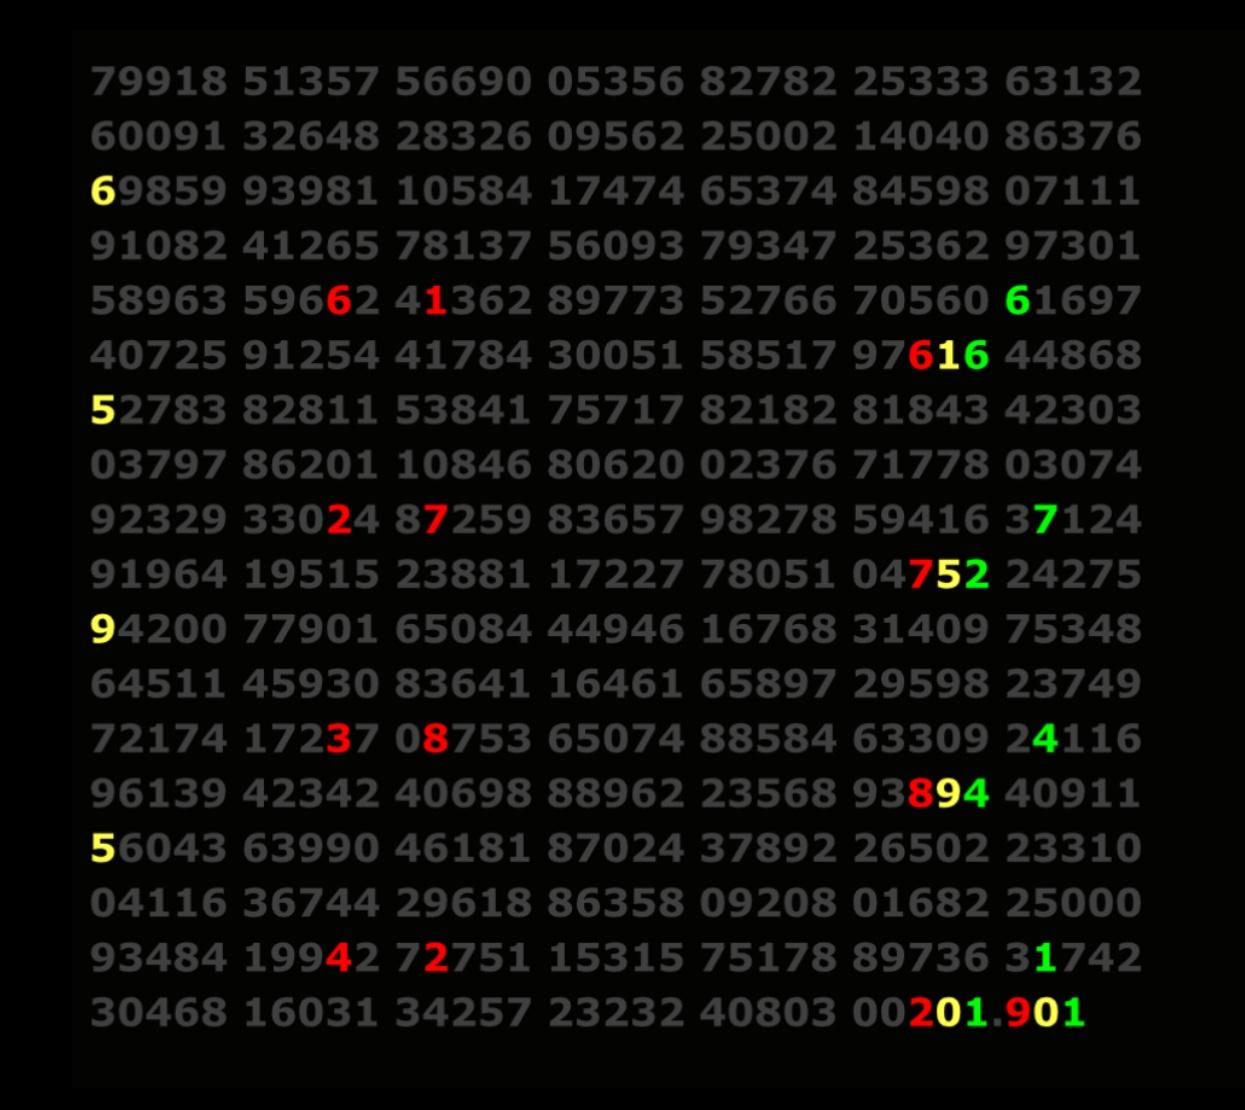 773E4386-1BB6-4B50-BEB4-C07593C4866C.jpeg